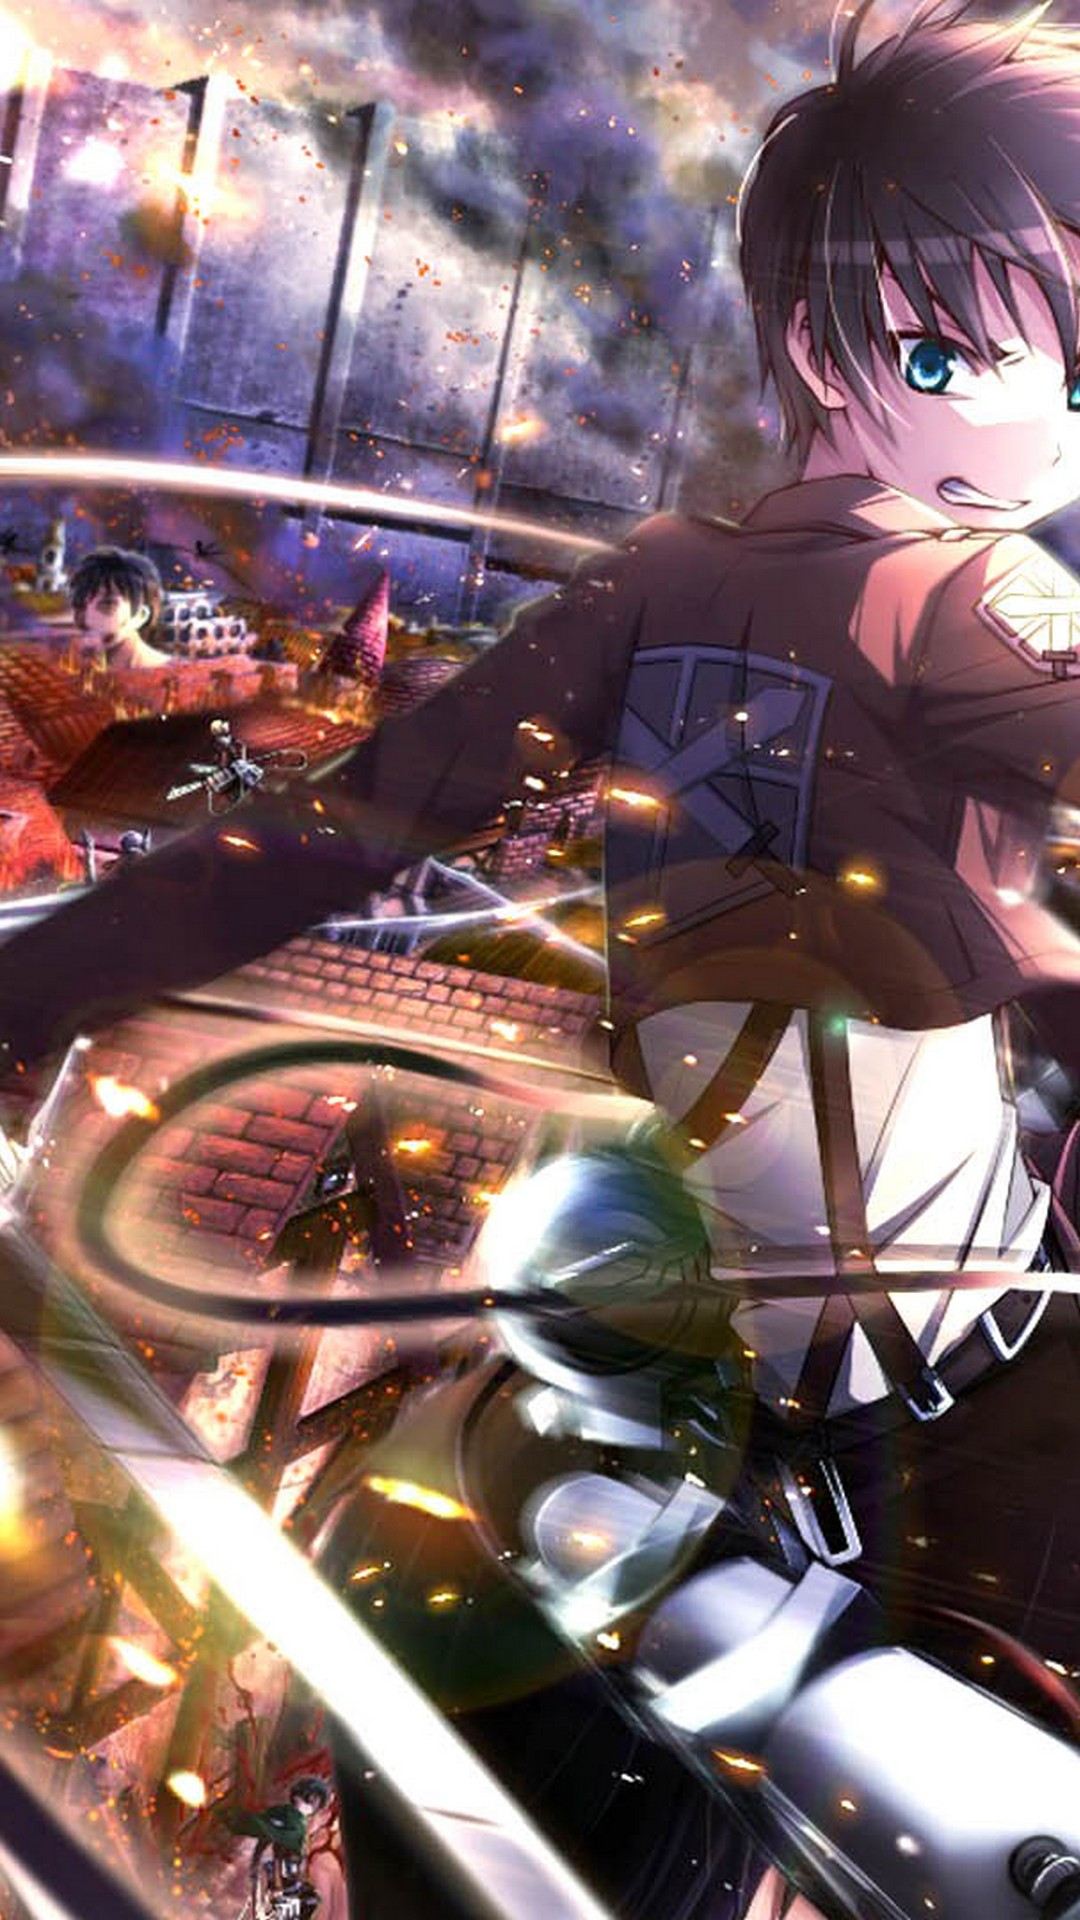 Anime Iphone 7 Wallpaper 2020 3d Iphone Wallpaper